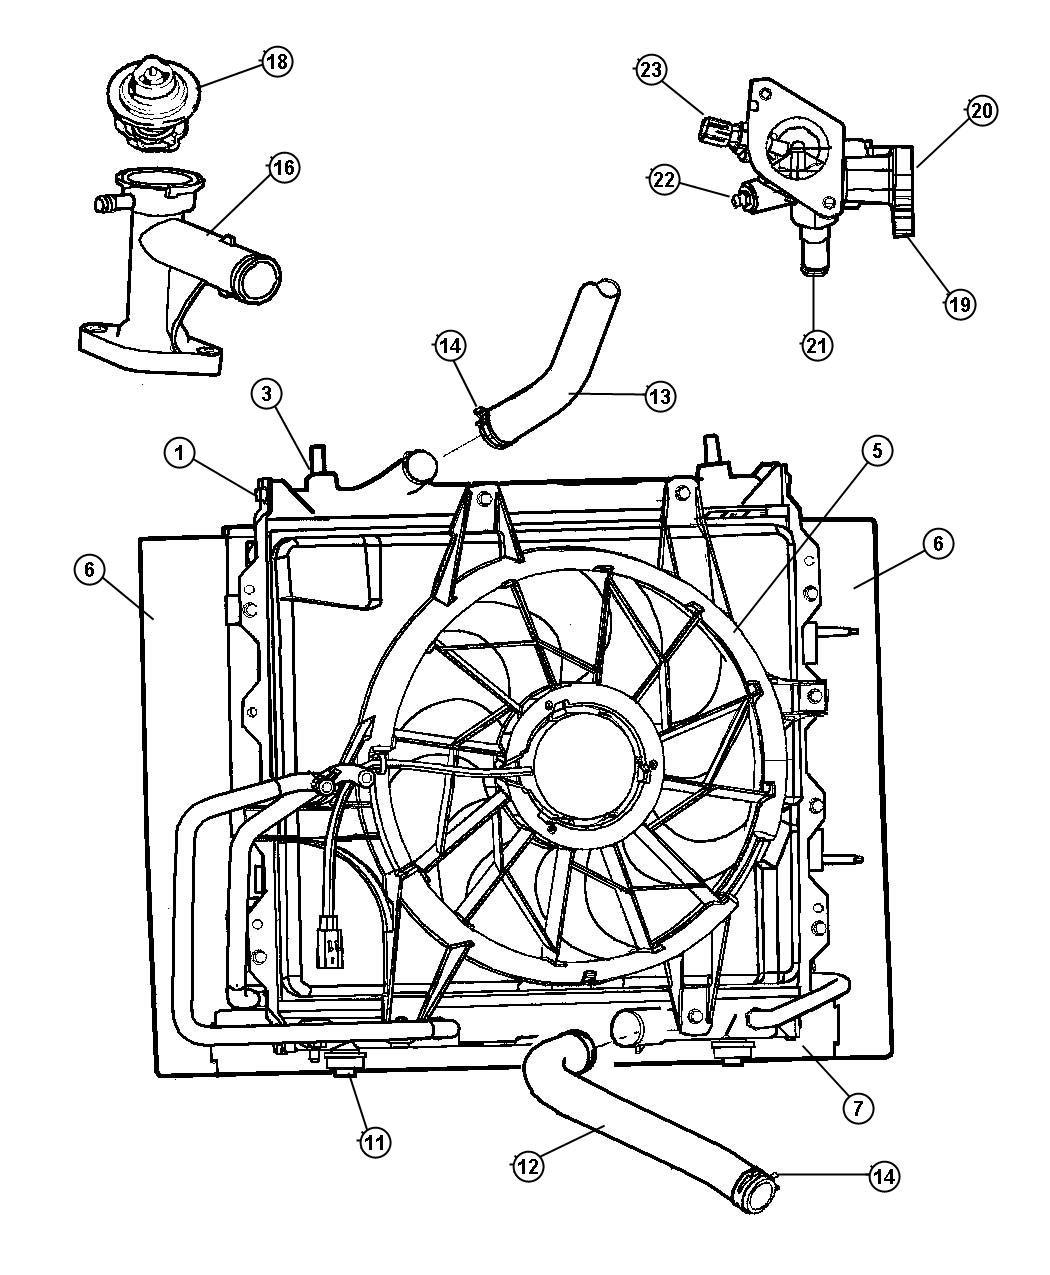 Pt Cruiser Engine Parts Diagram Free Wiring Diagram